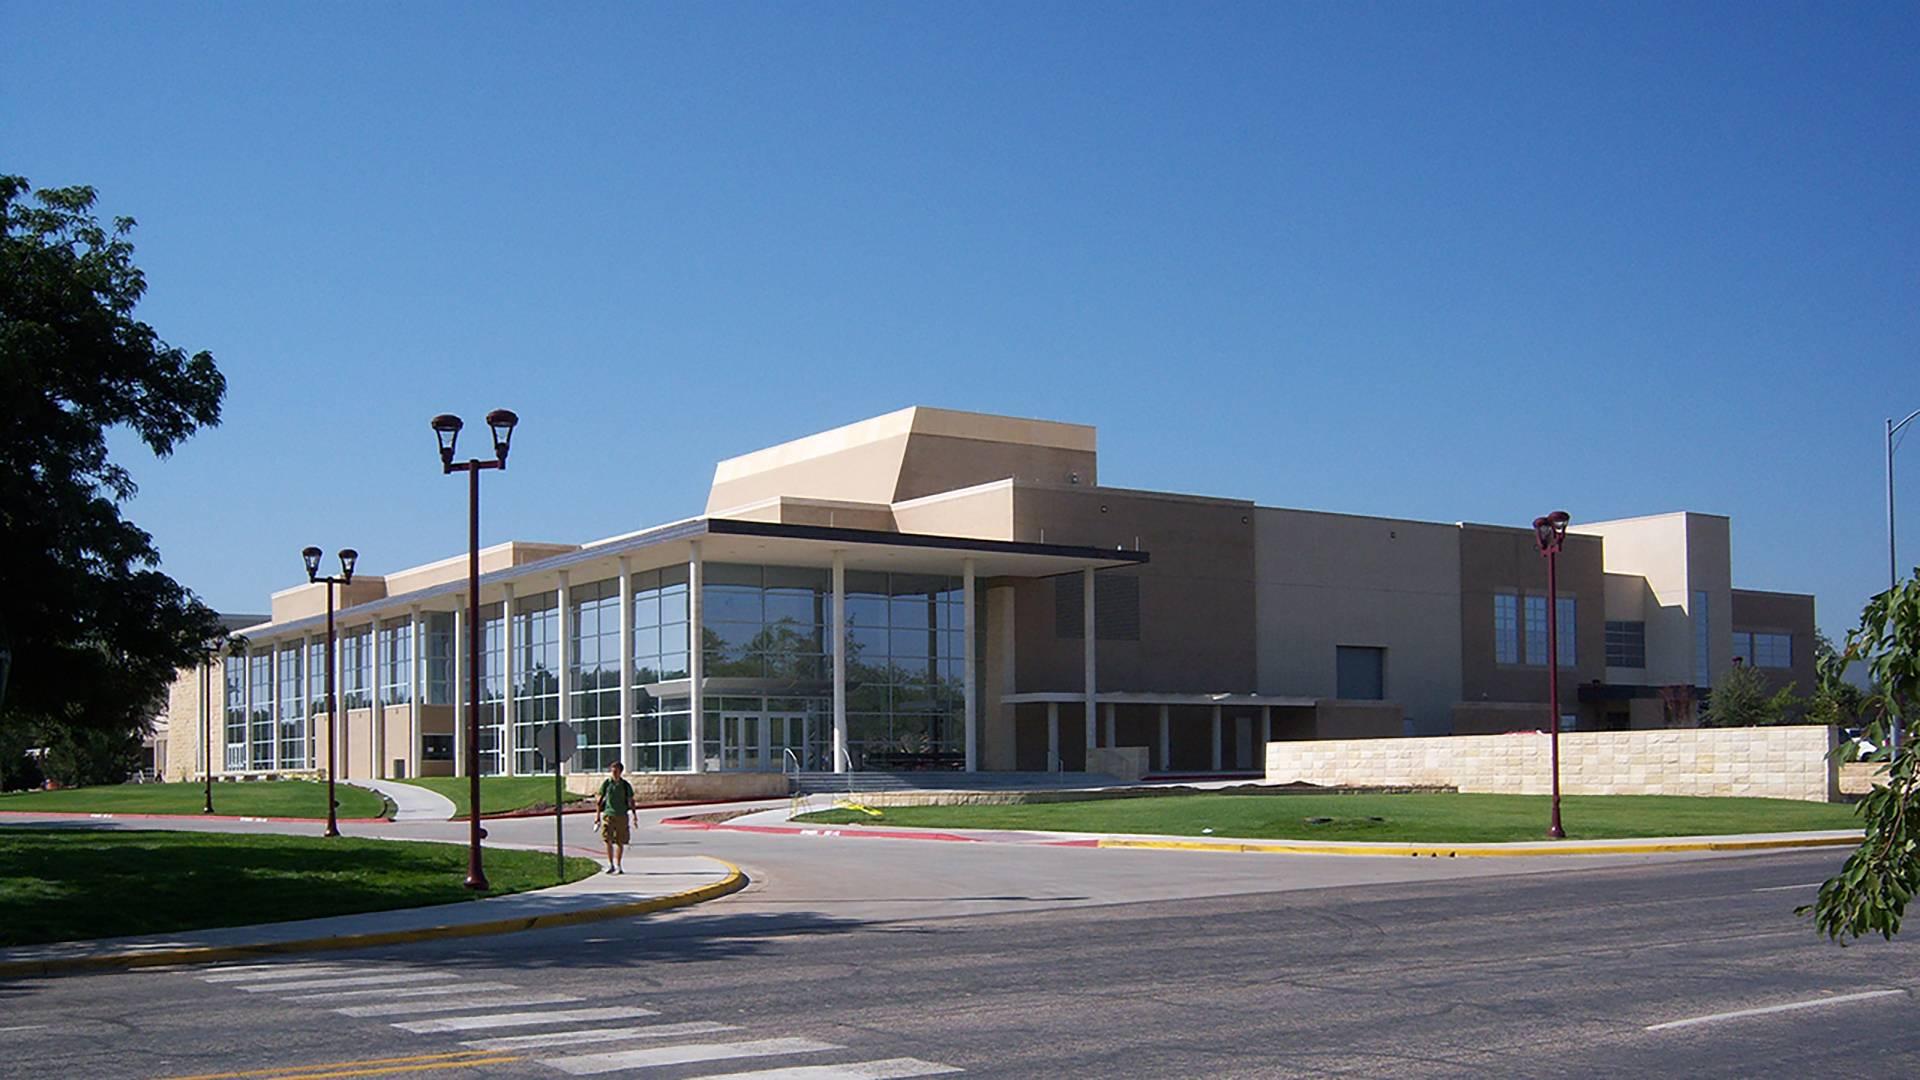 West Texas A&M University >> Season Preview A Look At West Texas A M University